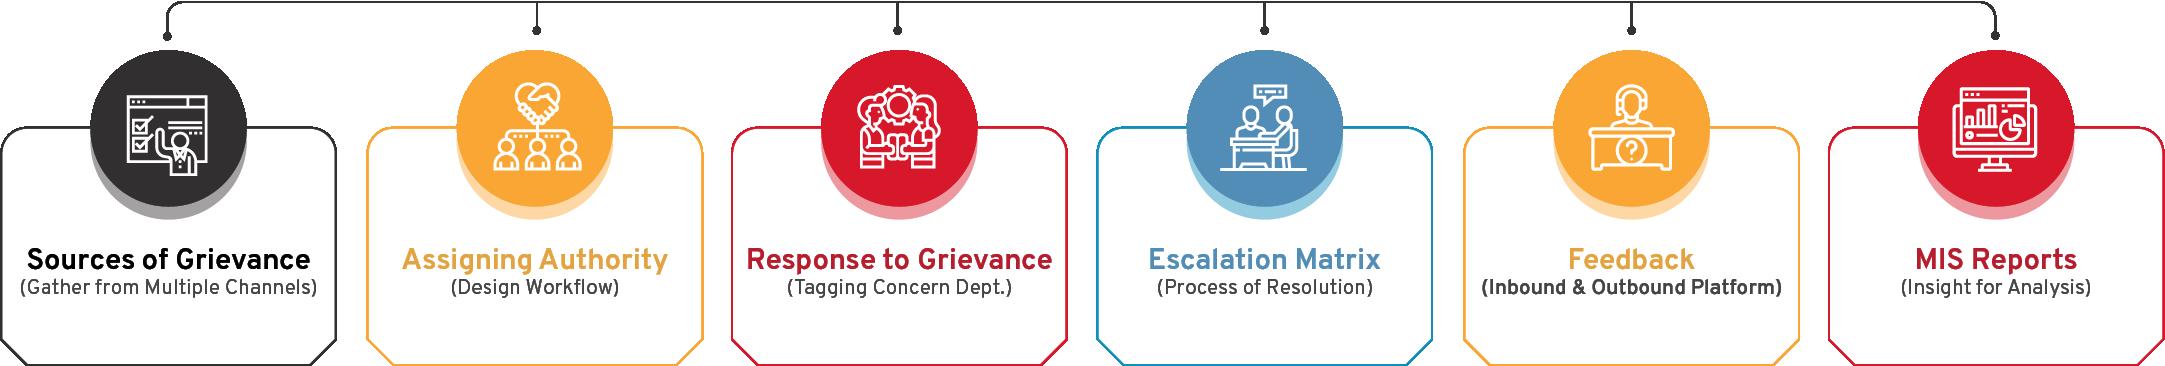 Grievance & Feedback Management System Flow Diagram - CSM Technologies